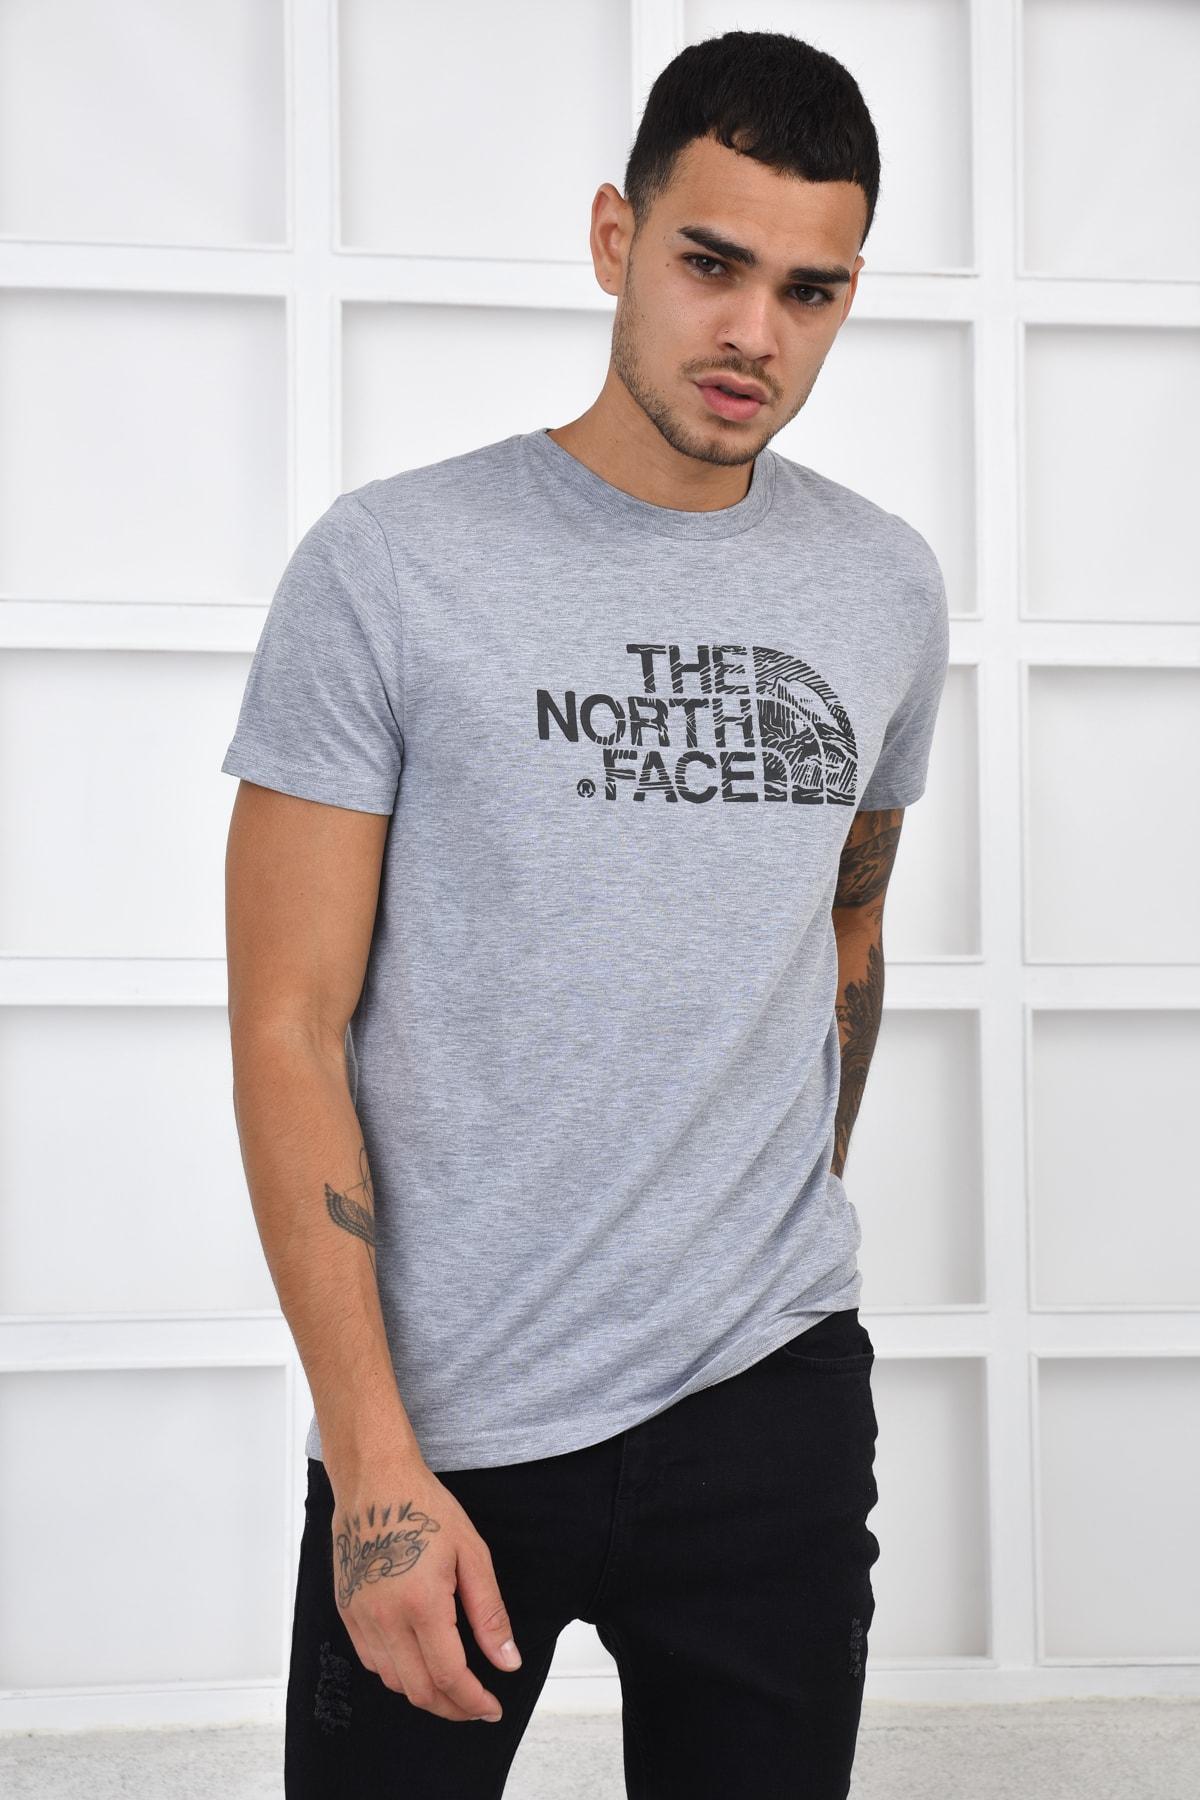 THE NORTH FACE Erkek T-shirt - Gri 2